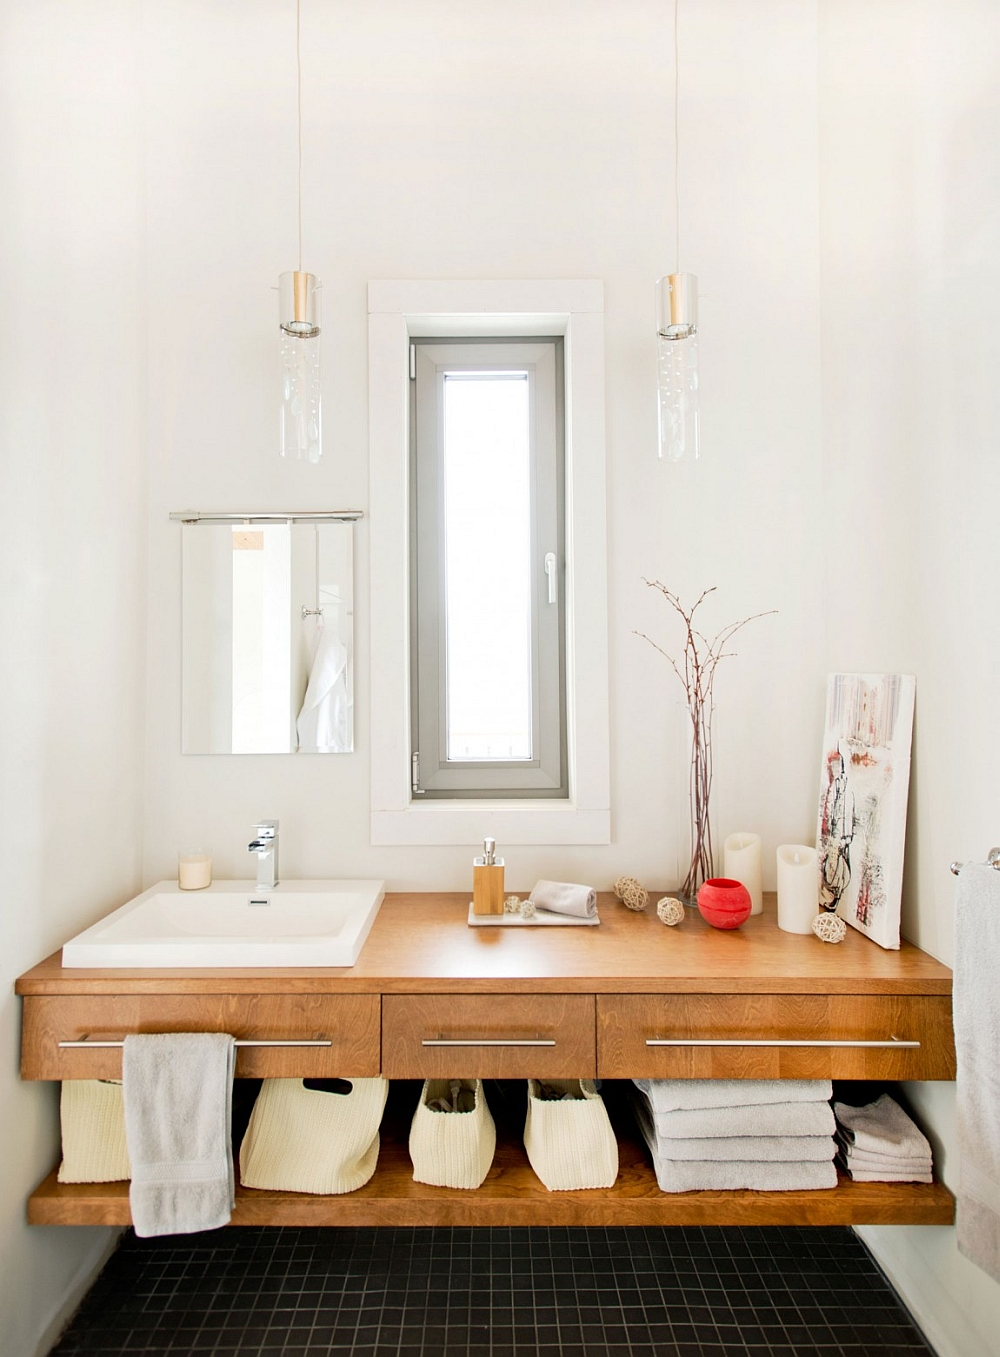 White bathroom with black floor tiles and wooden vanity